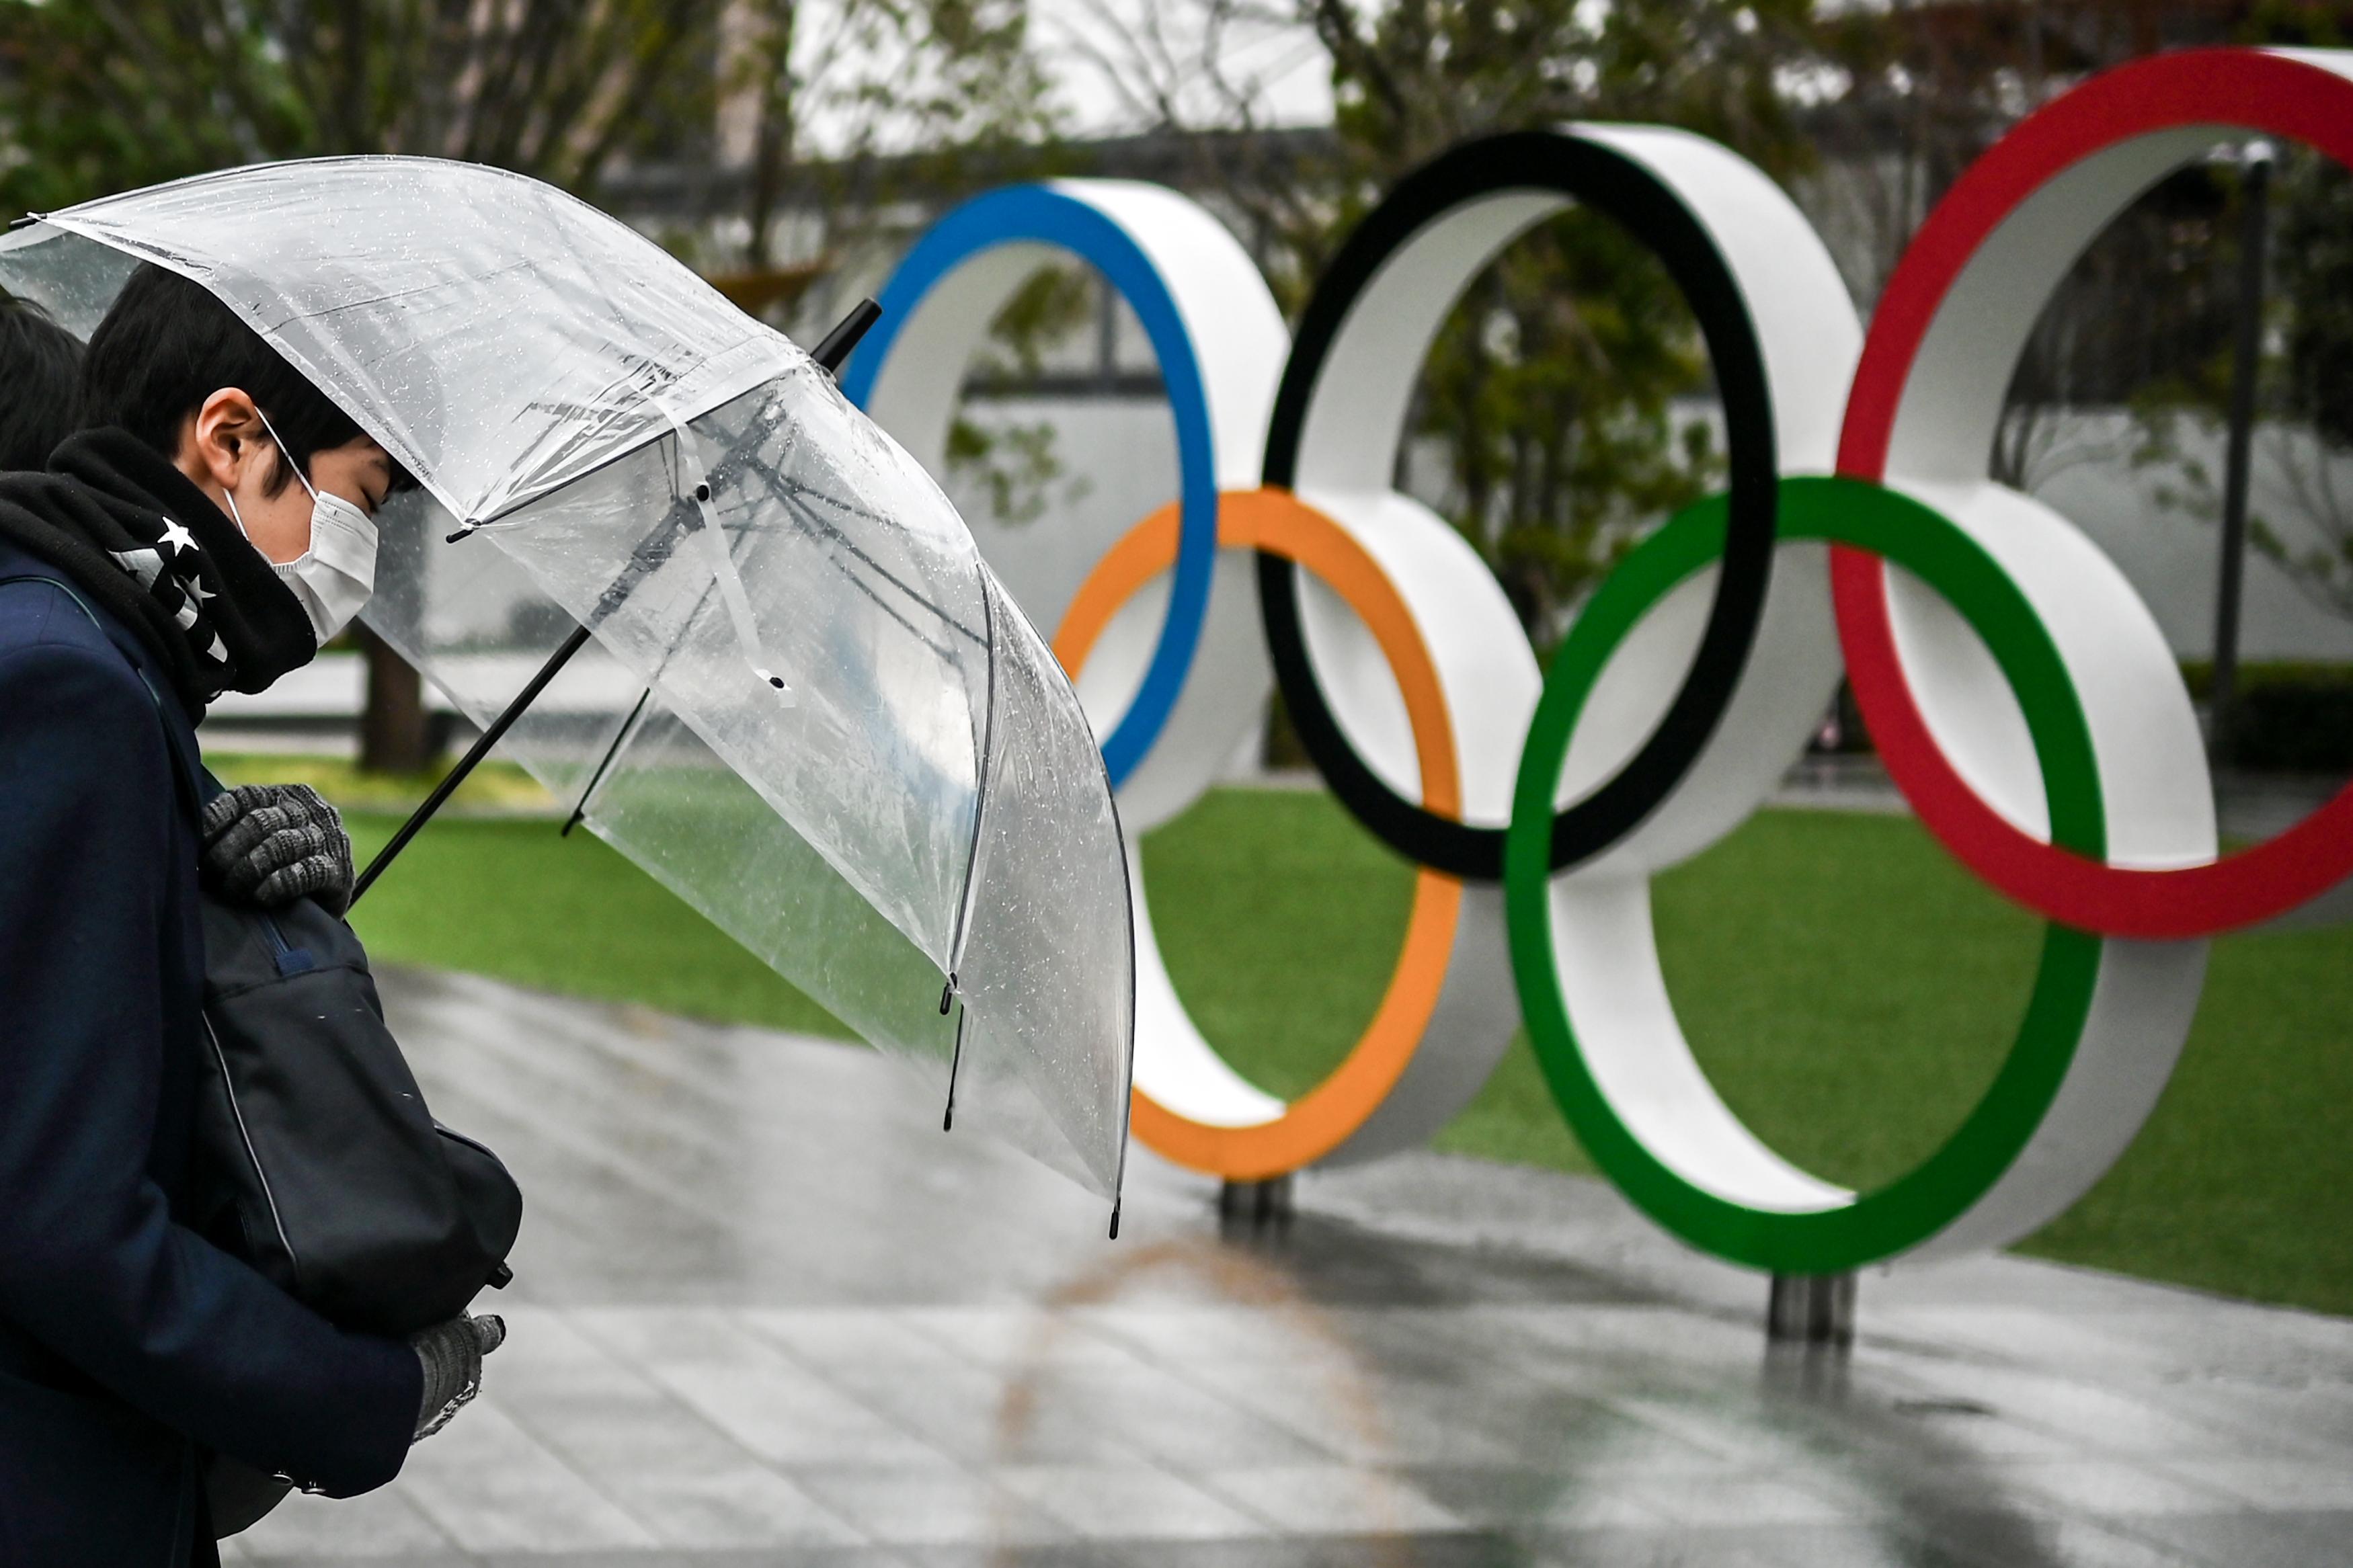 Olympics will happen 'however coronavirus evolves': Tokyo 2020 chief